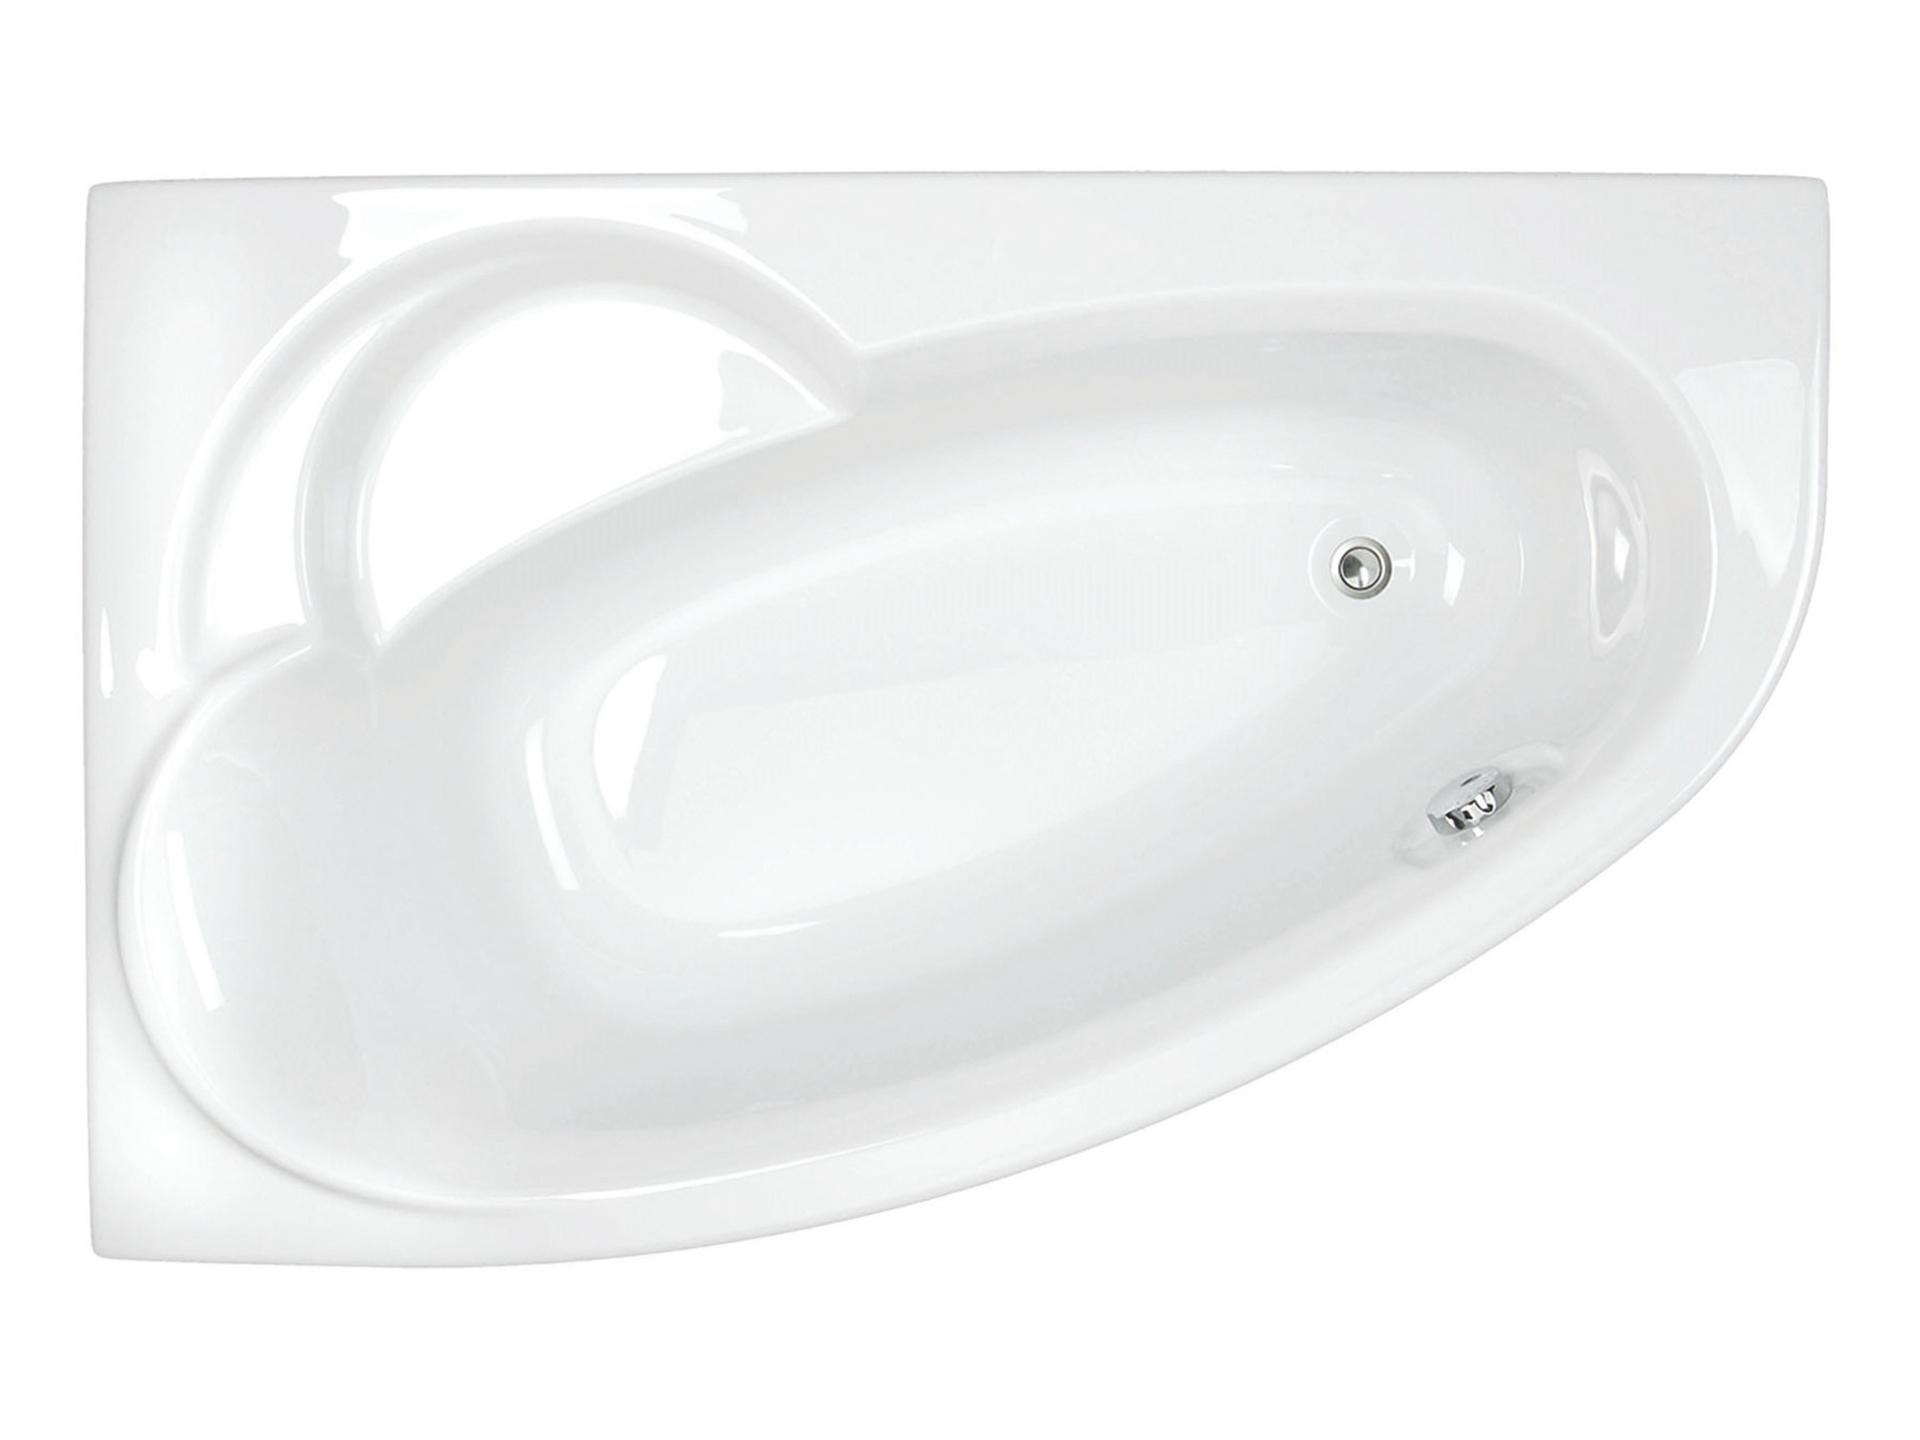 baignoire 130x90 perfect agrandir une mini baignoire ronde et lgante with baignoire 130x90. Black Bedroom Furniture Sets. Home Design Ideas